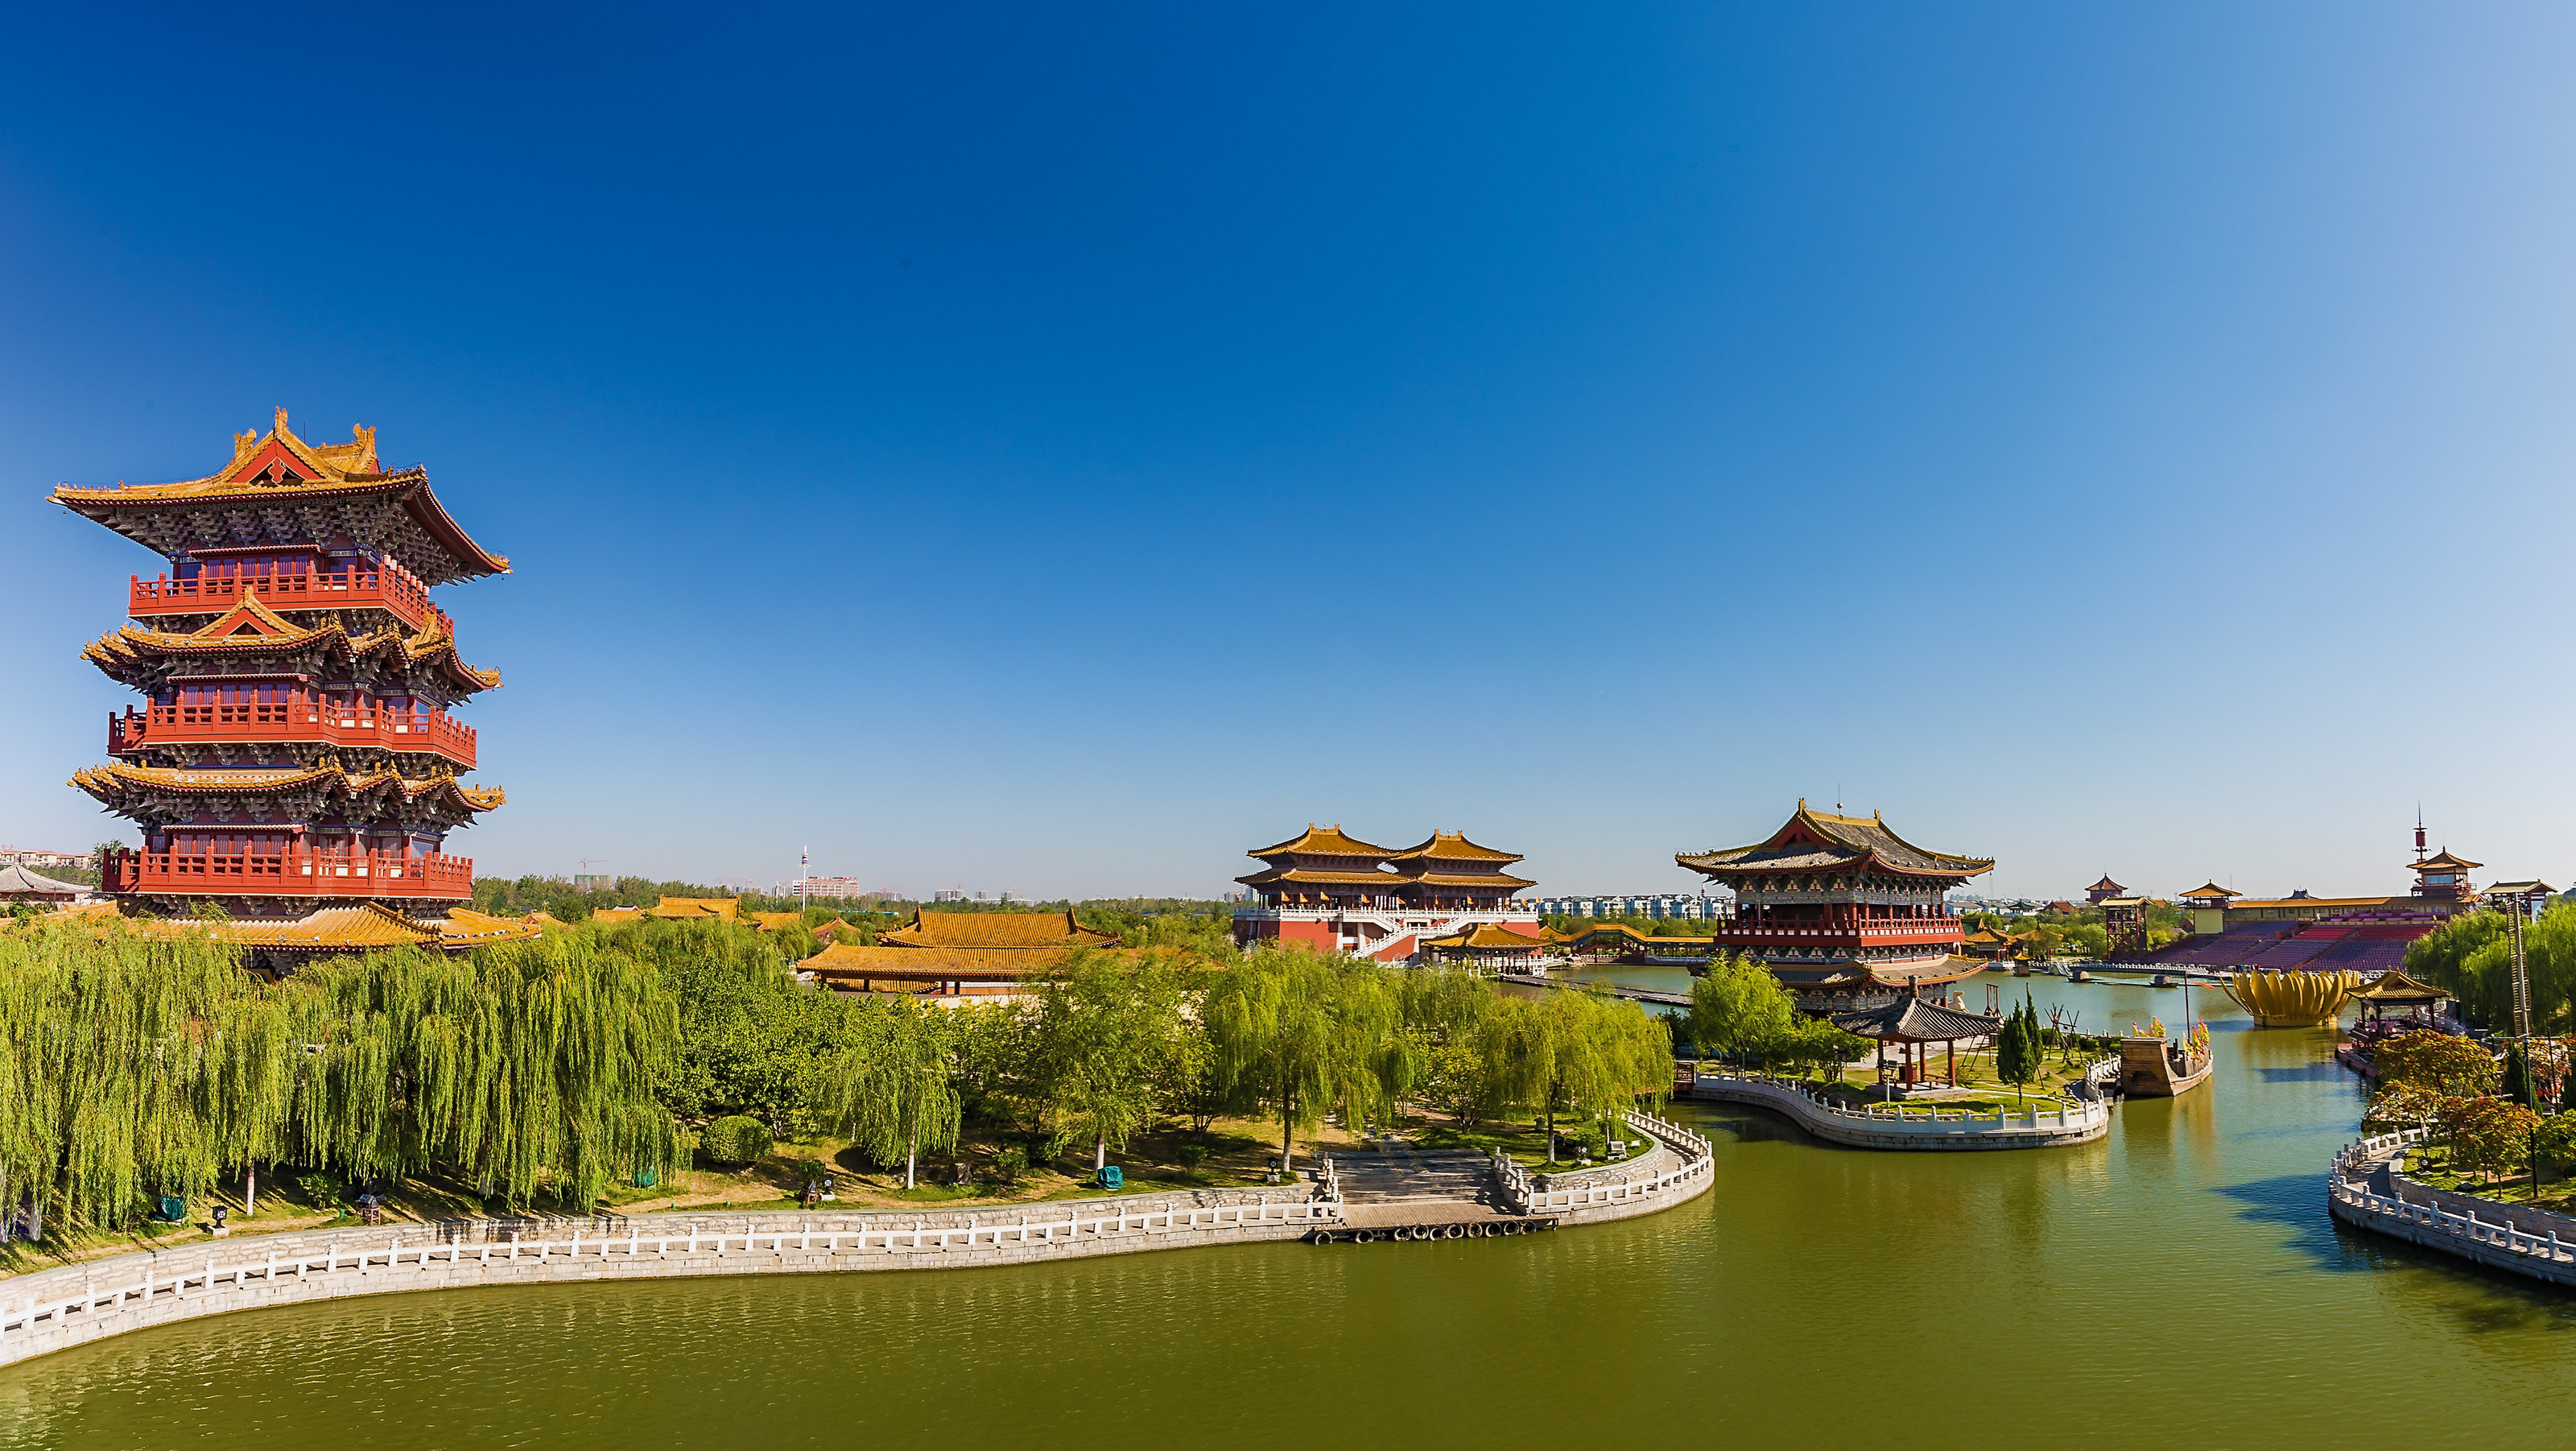 Qingming Riverside Landscape Garden